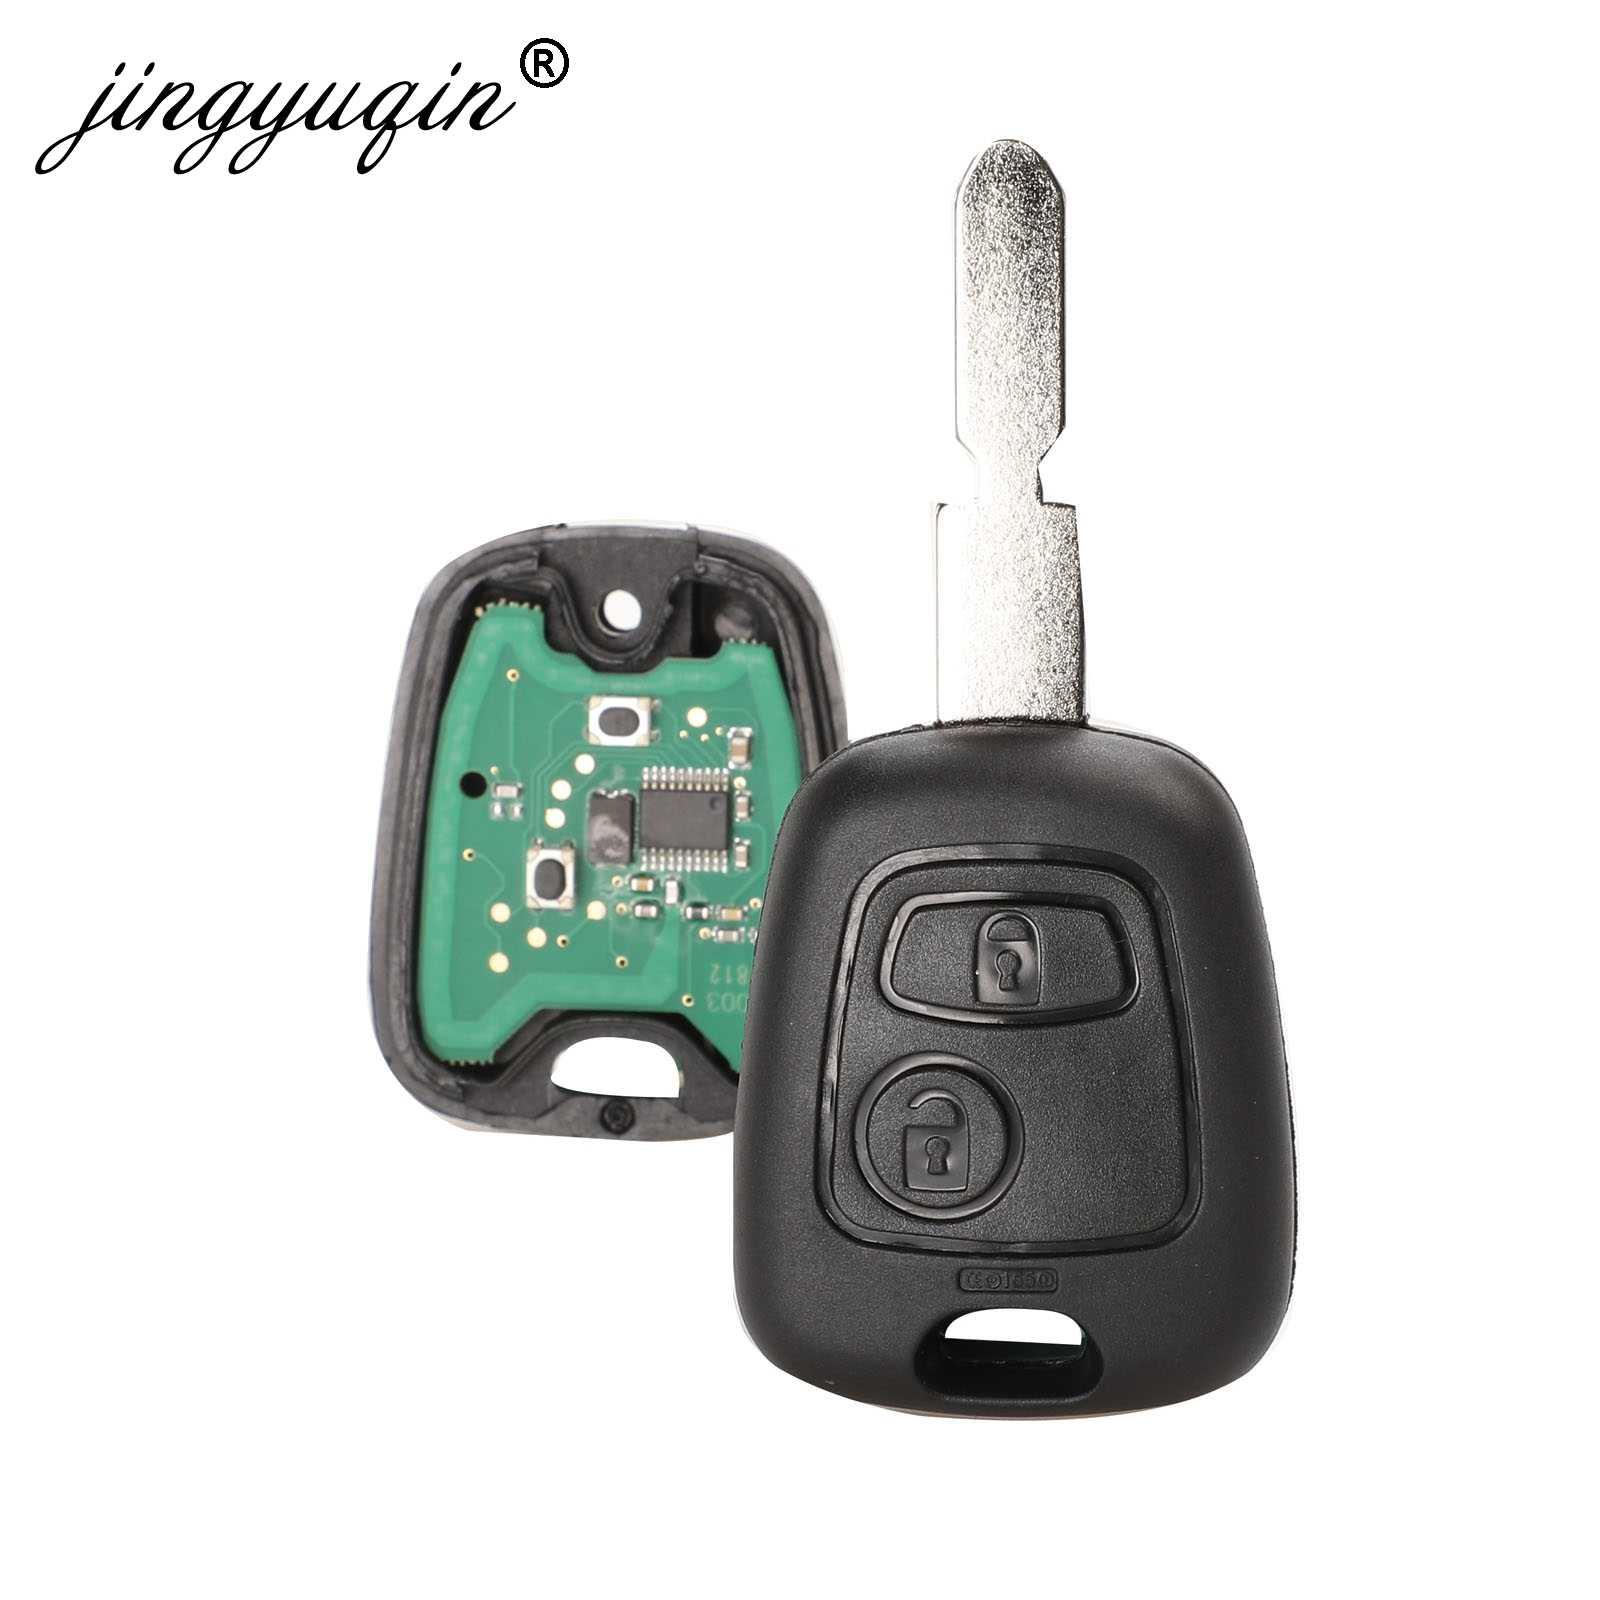 2 Button Remote Car Key Fob For Citroen C1 C2 C3 C4 Saxo Picasso Xsara Picasso Peugeot 106 206 306 307 107 207 407 Partner Car Key Aliexpress